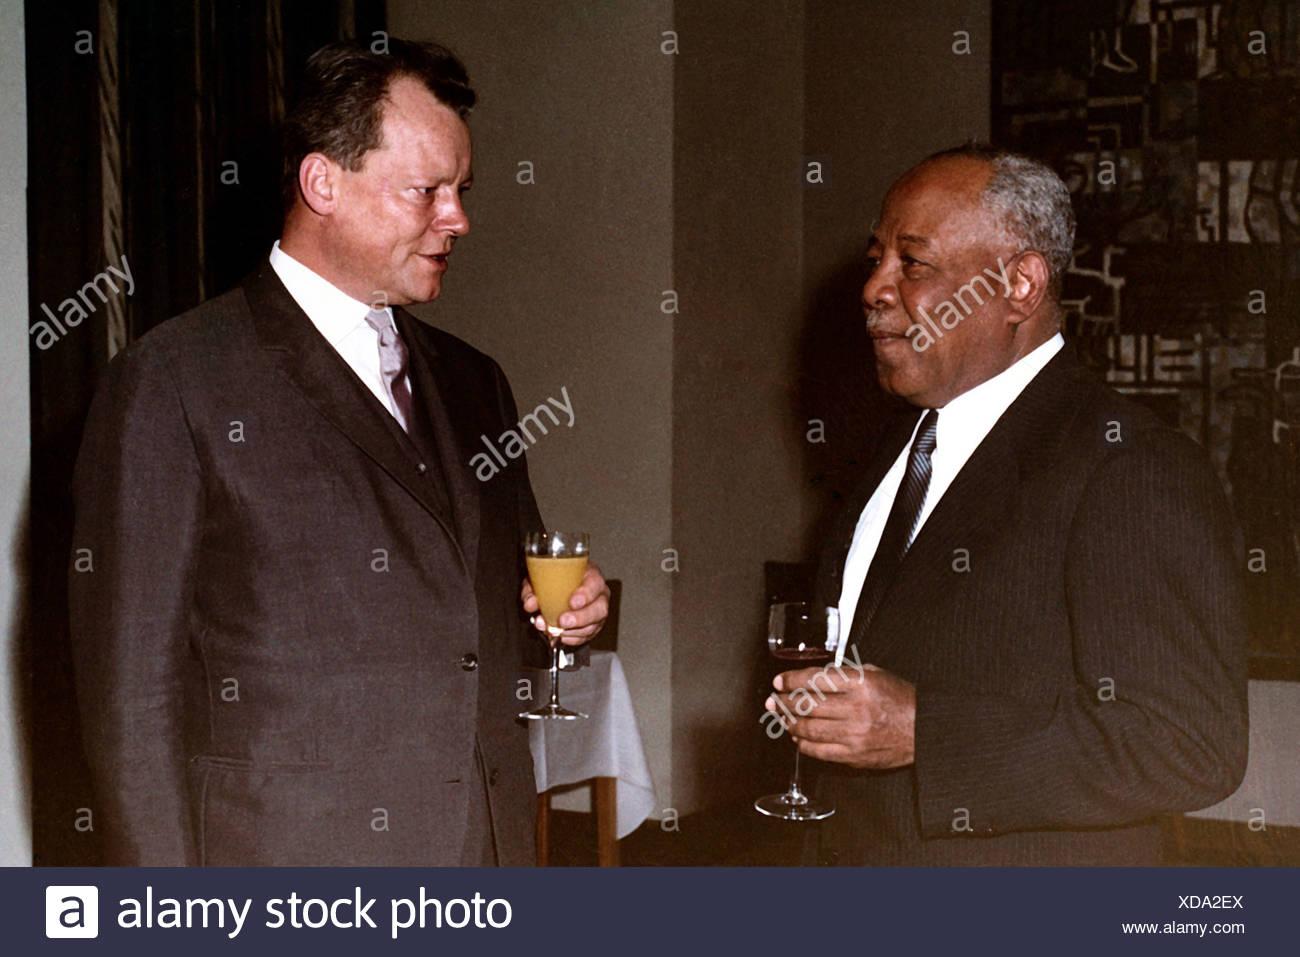 Brandt, Willy, 18.12.1913 - 8.10.1992, German politician (SPD), mayor of Berlin 1957 - 1966, with General Abboud (Sudan), half l Stockbild